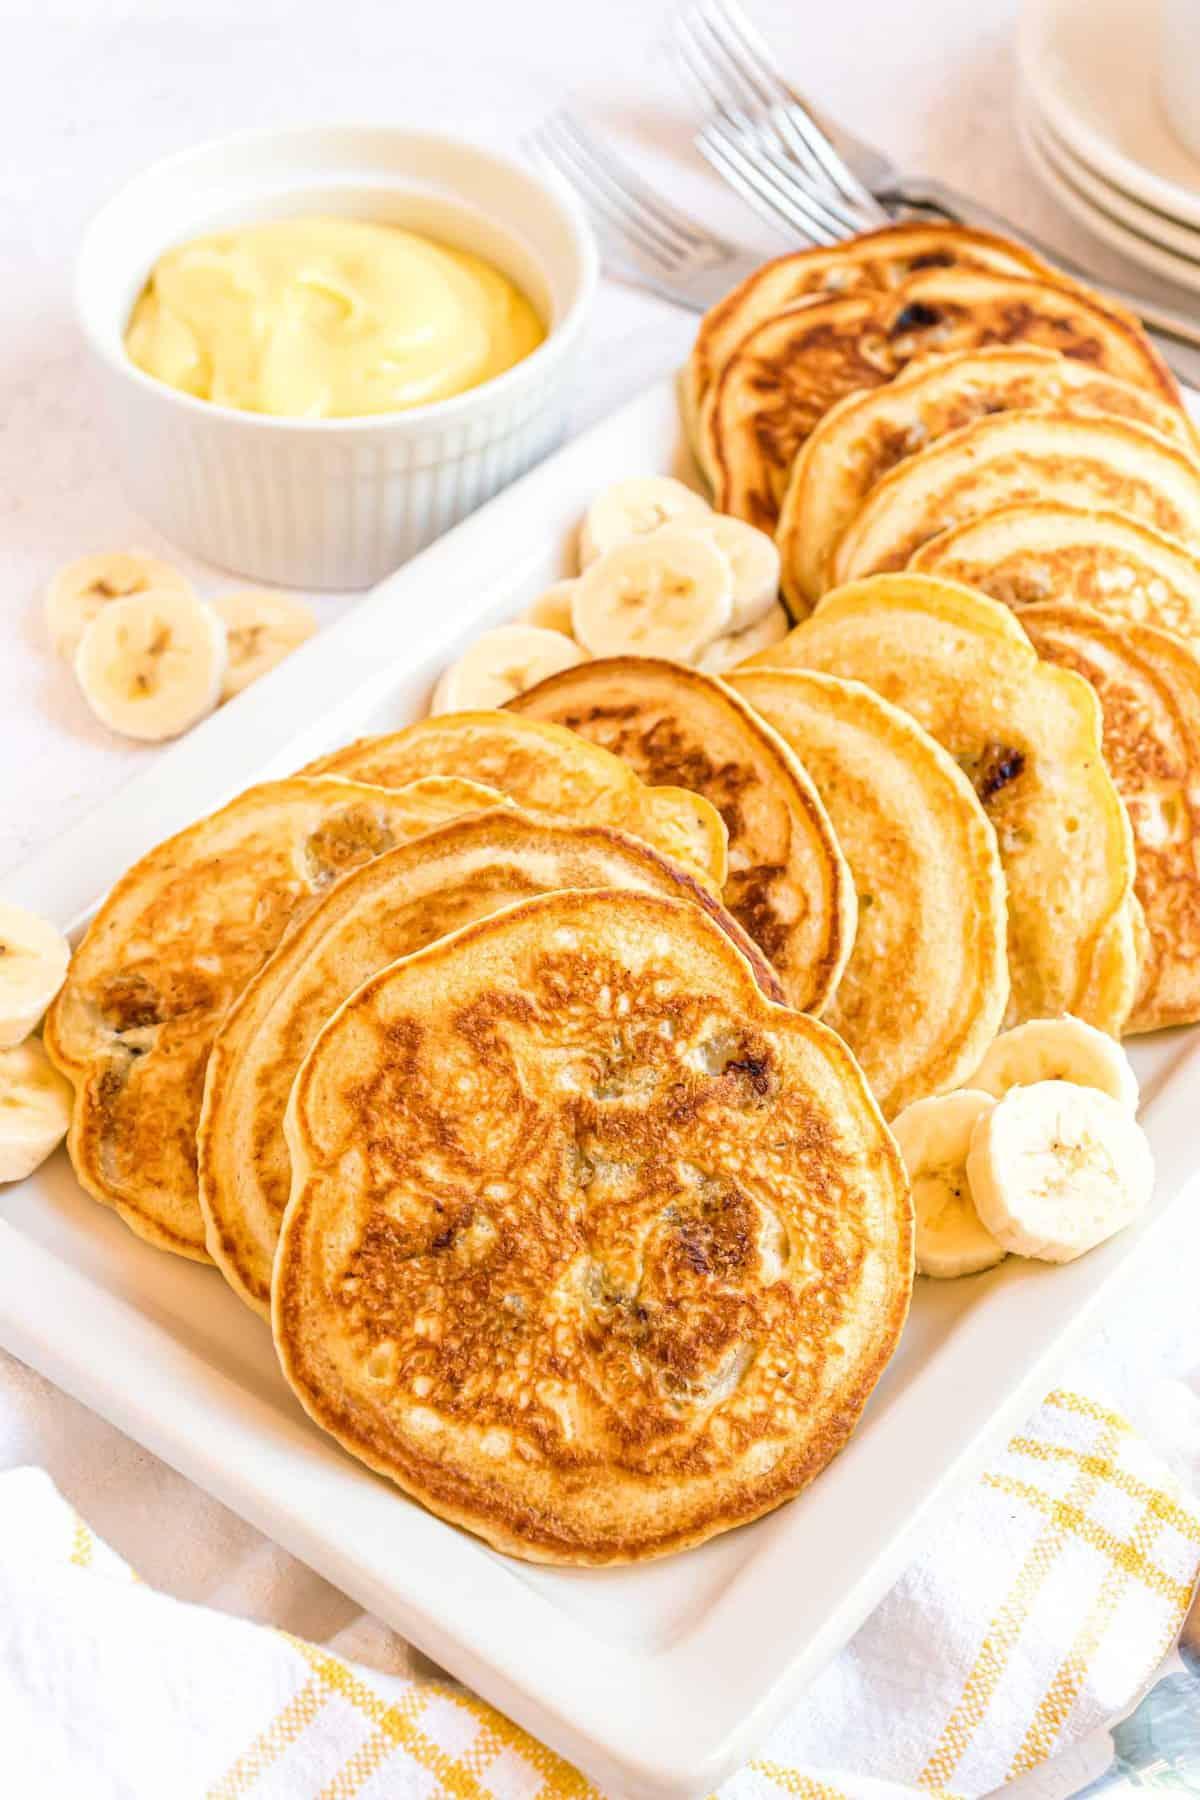 Pancakes on a platter.